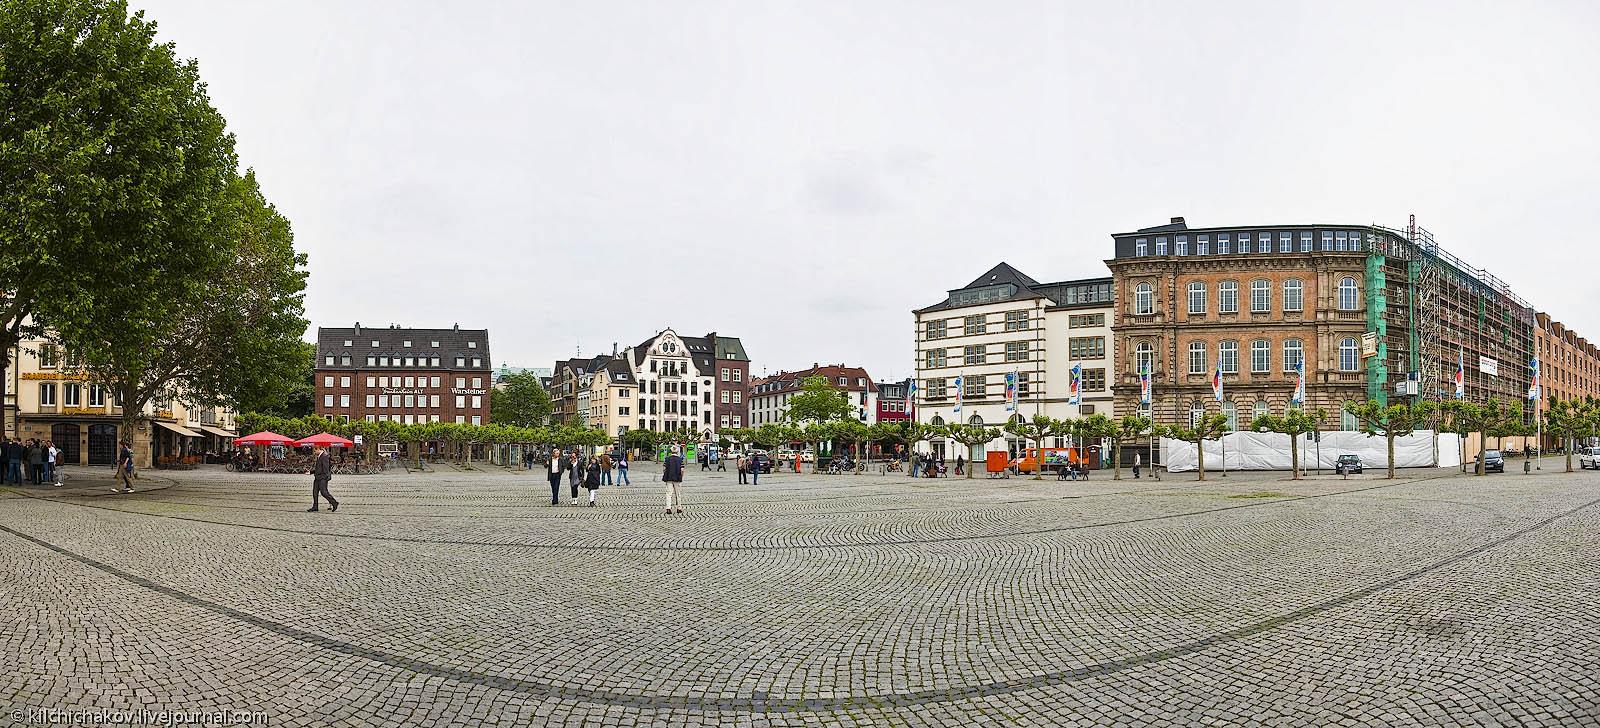 DSC05132-Panorama copy